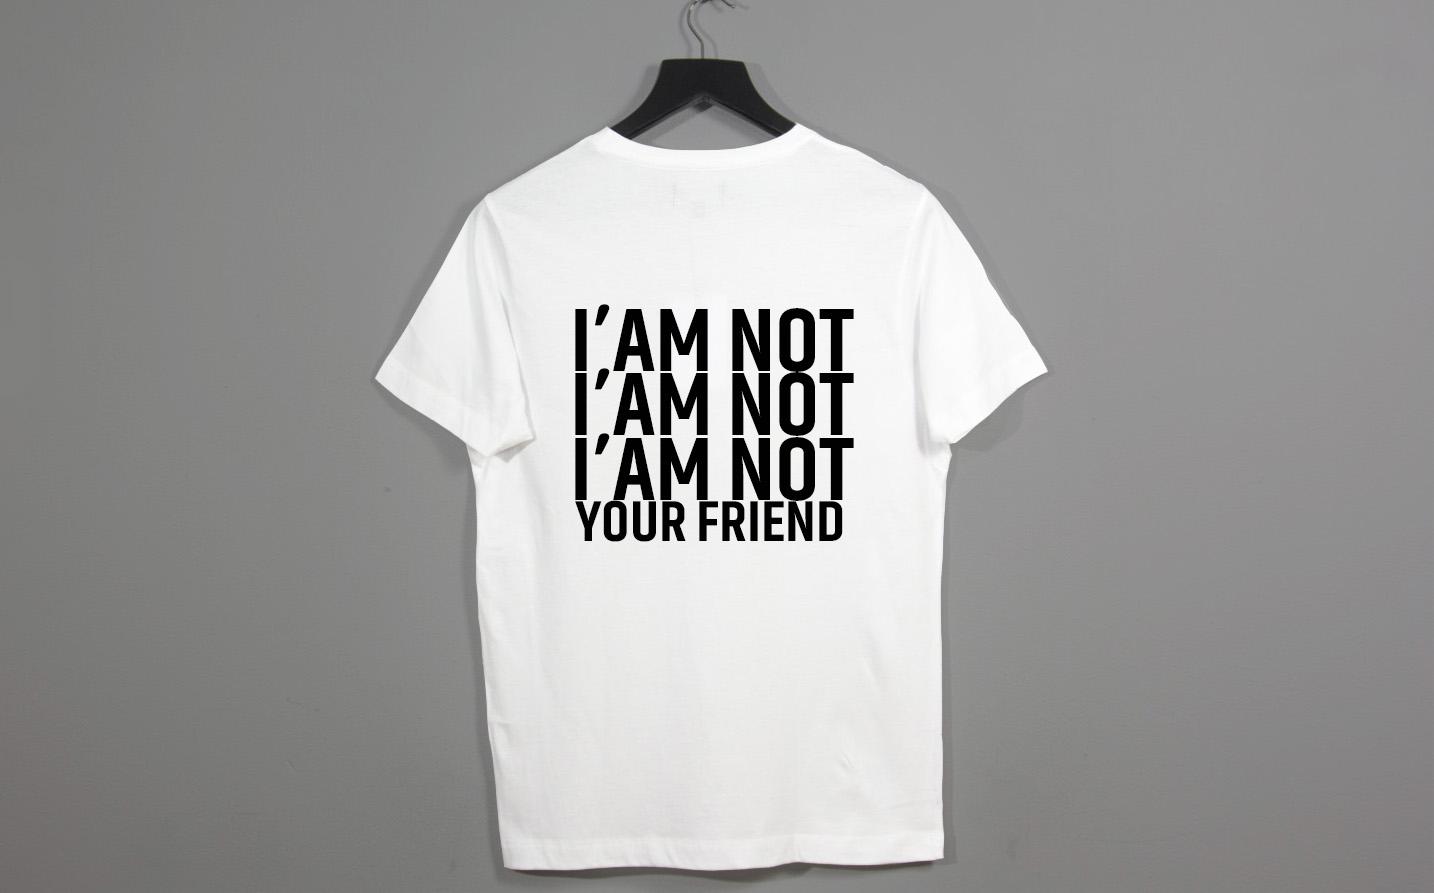 T-shirt -  I'am not your friend